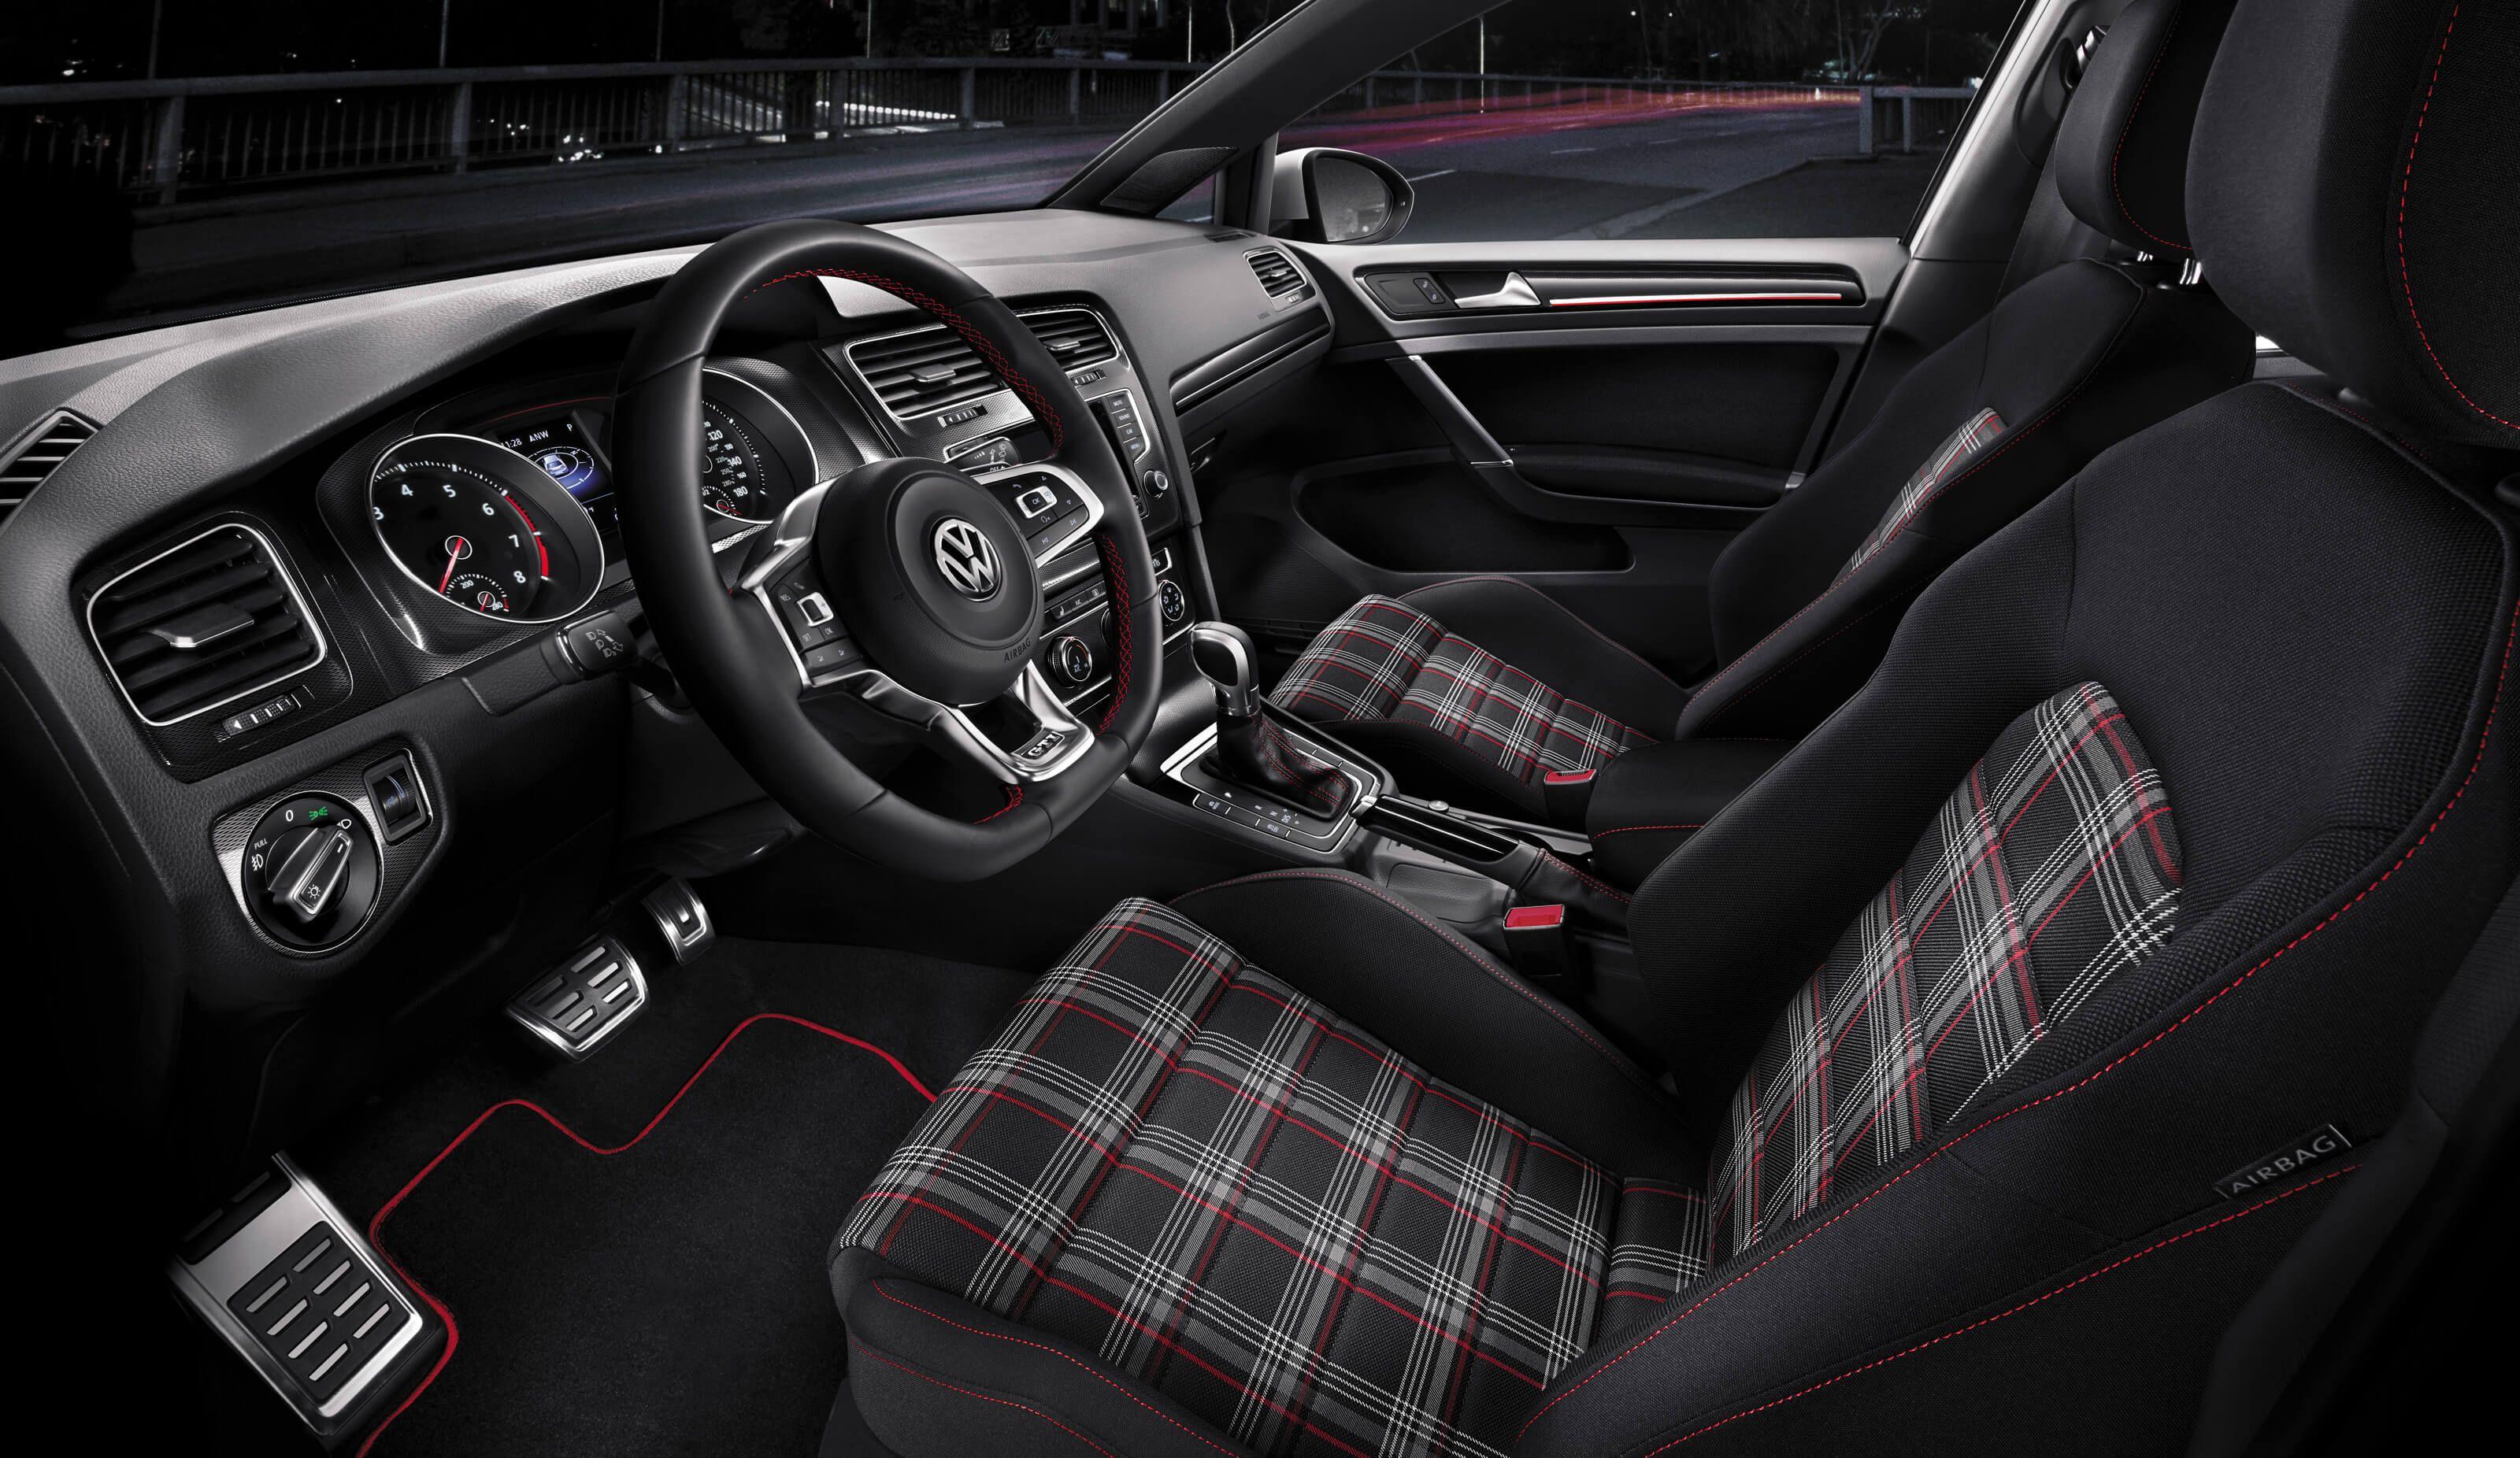 2017 VW Golf GTI - Performance Hot Hatch   Volkswagen   Automobile ...   {Auto cockpit vw 35}